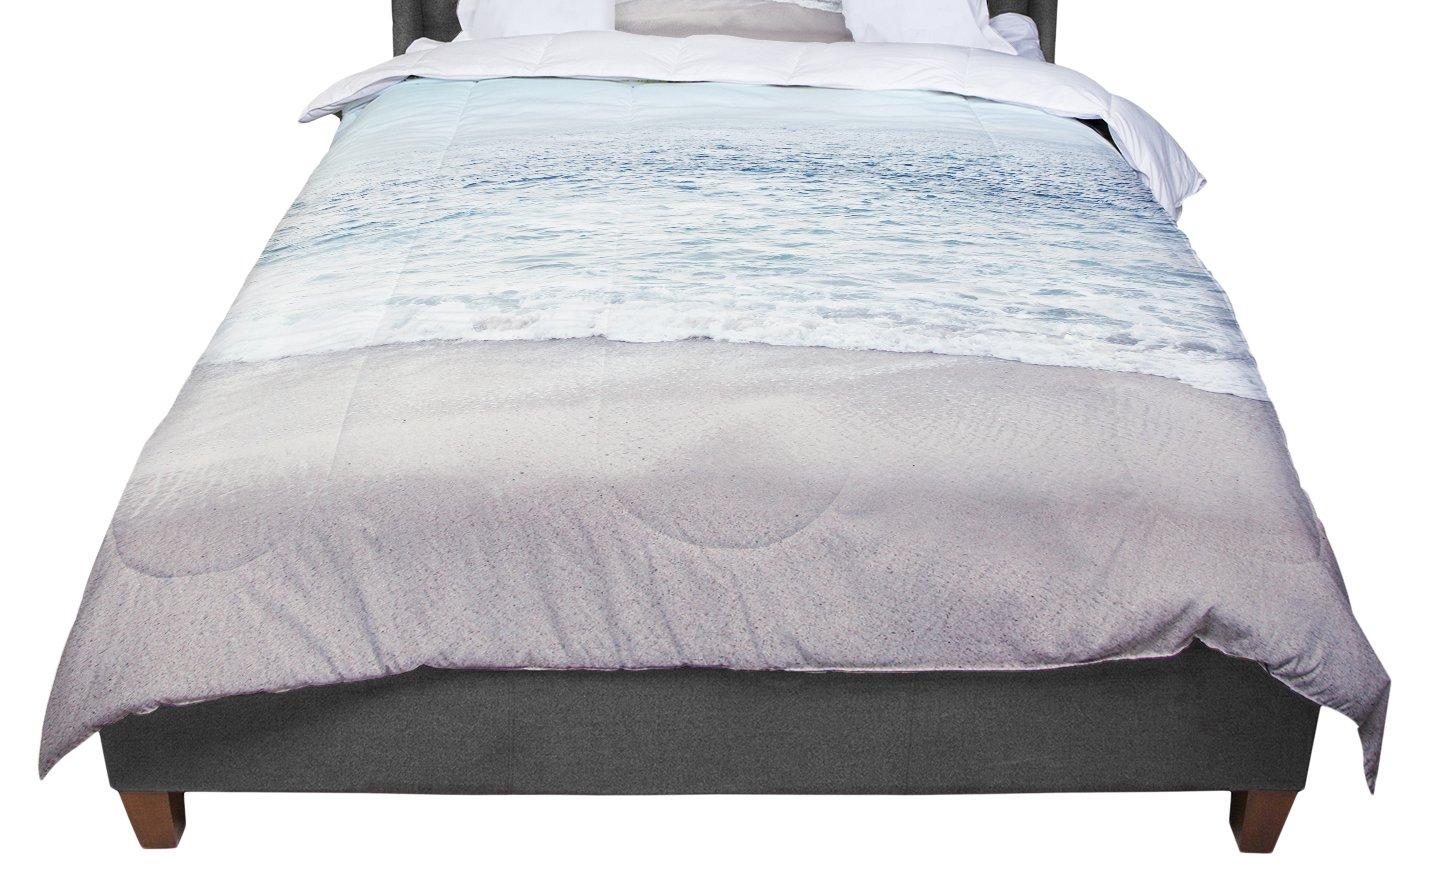 68 X 88 KESS InHouse Robin Dickinson Brave The Storm Snow Mountain Twin Comforter